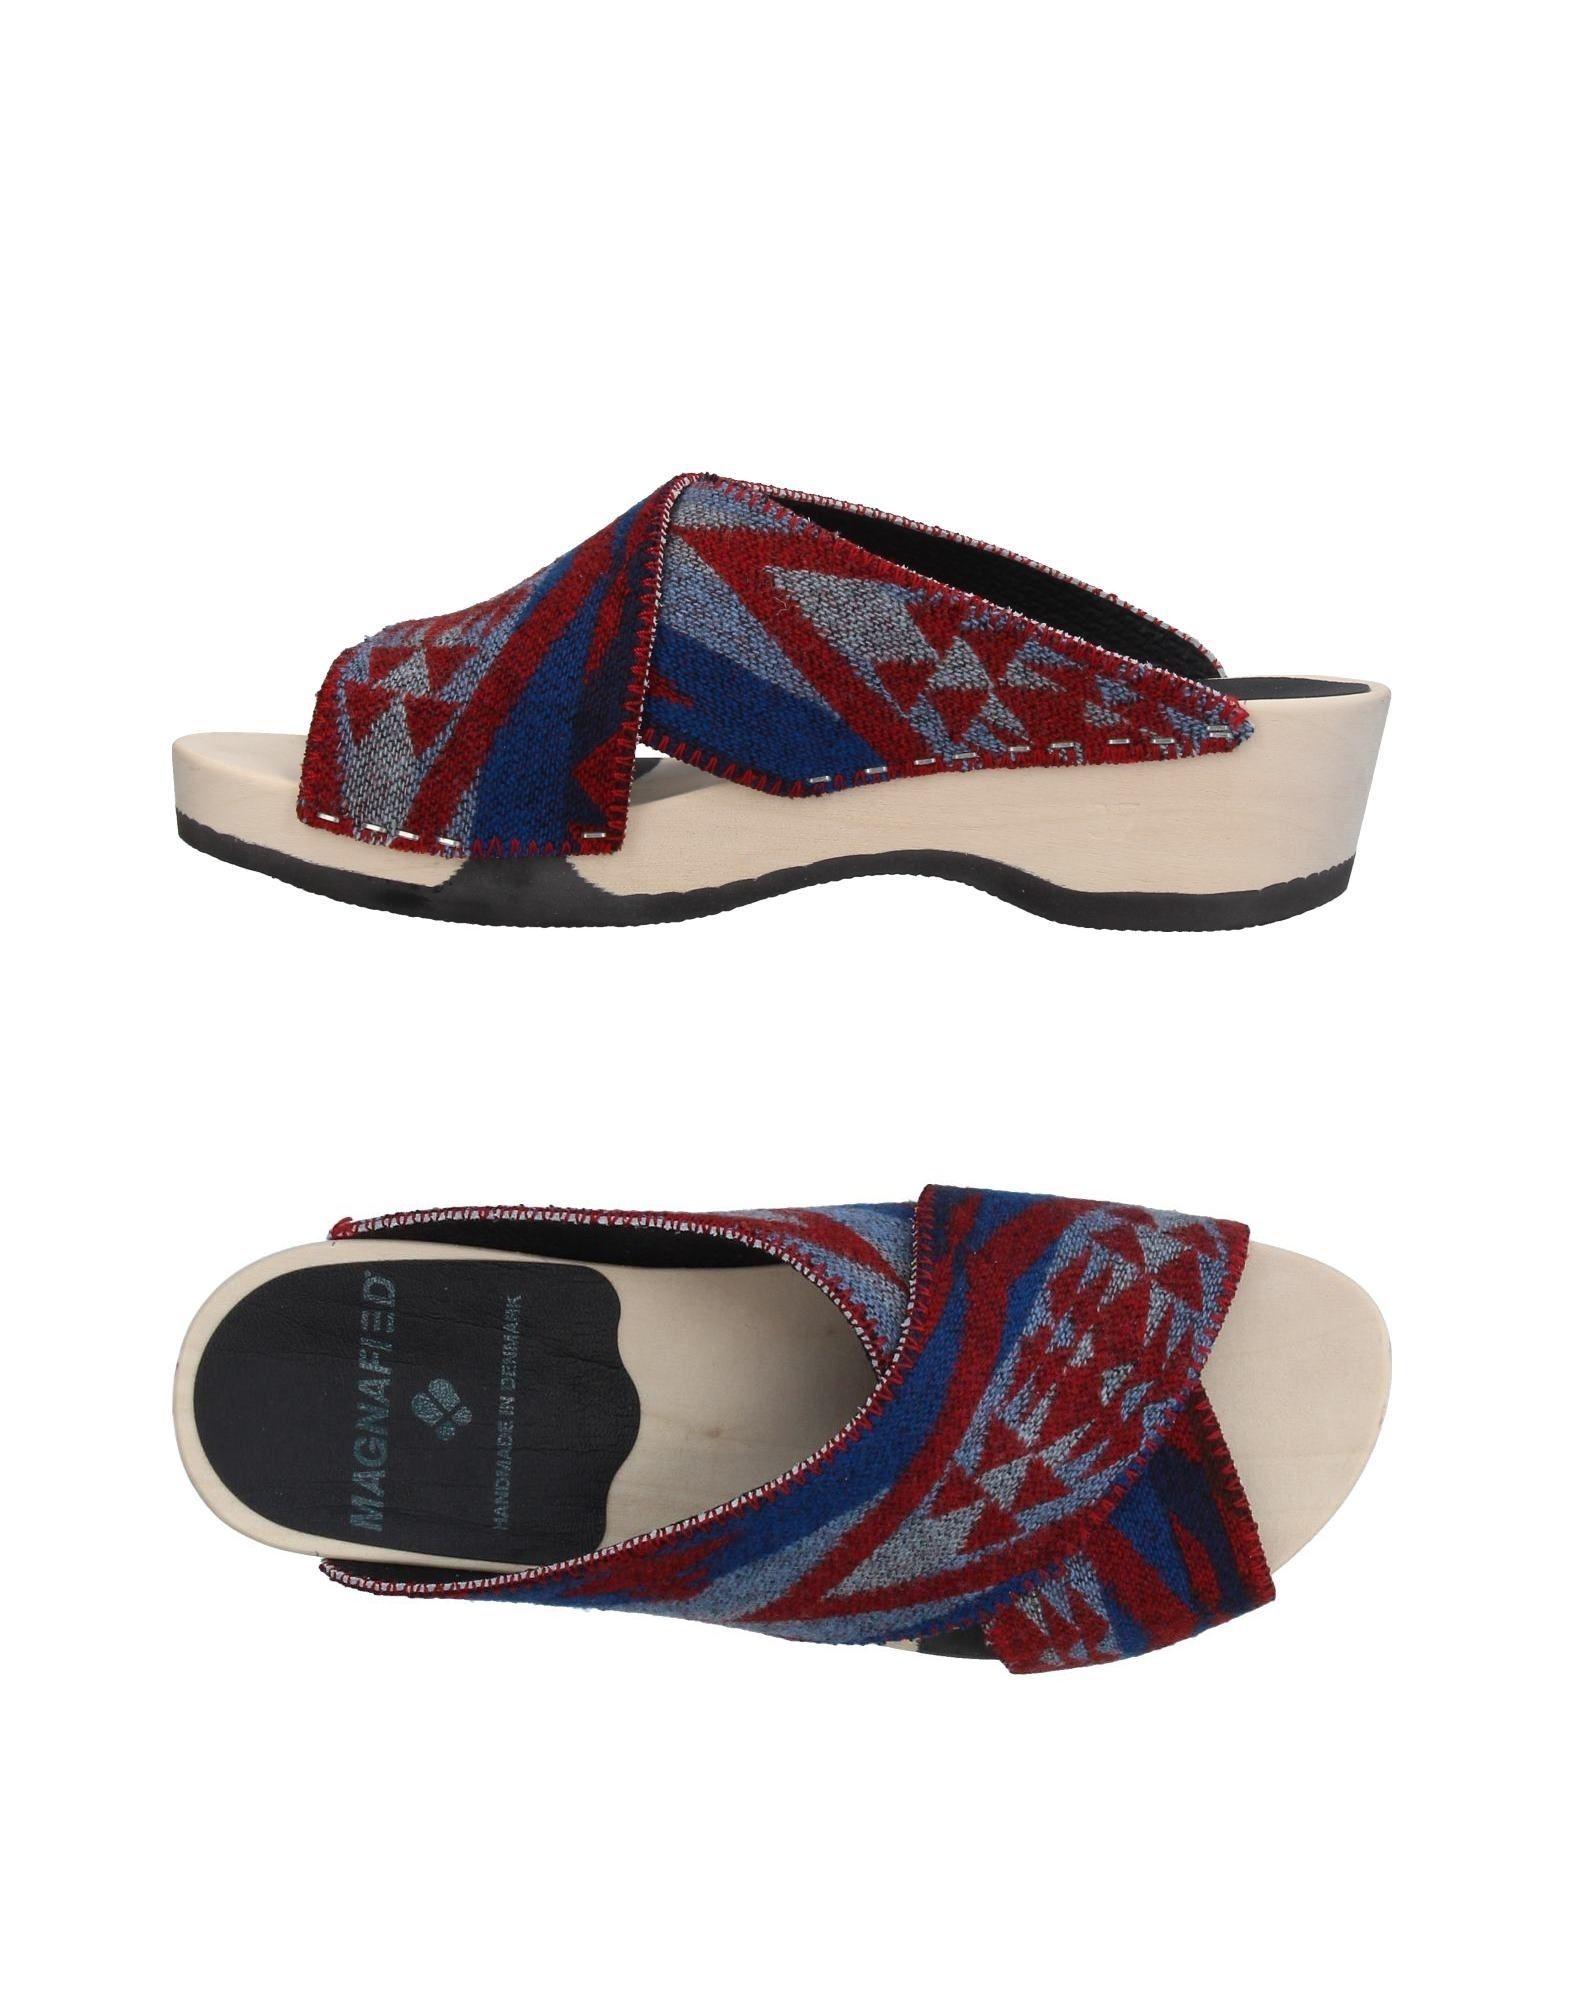 Haltbare Mode billige Schuhe Magnafied Sandalen Damen  11367264ME Heiße Schuhe